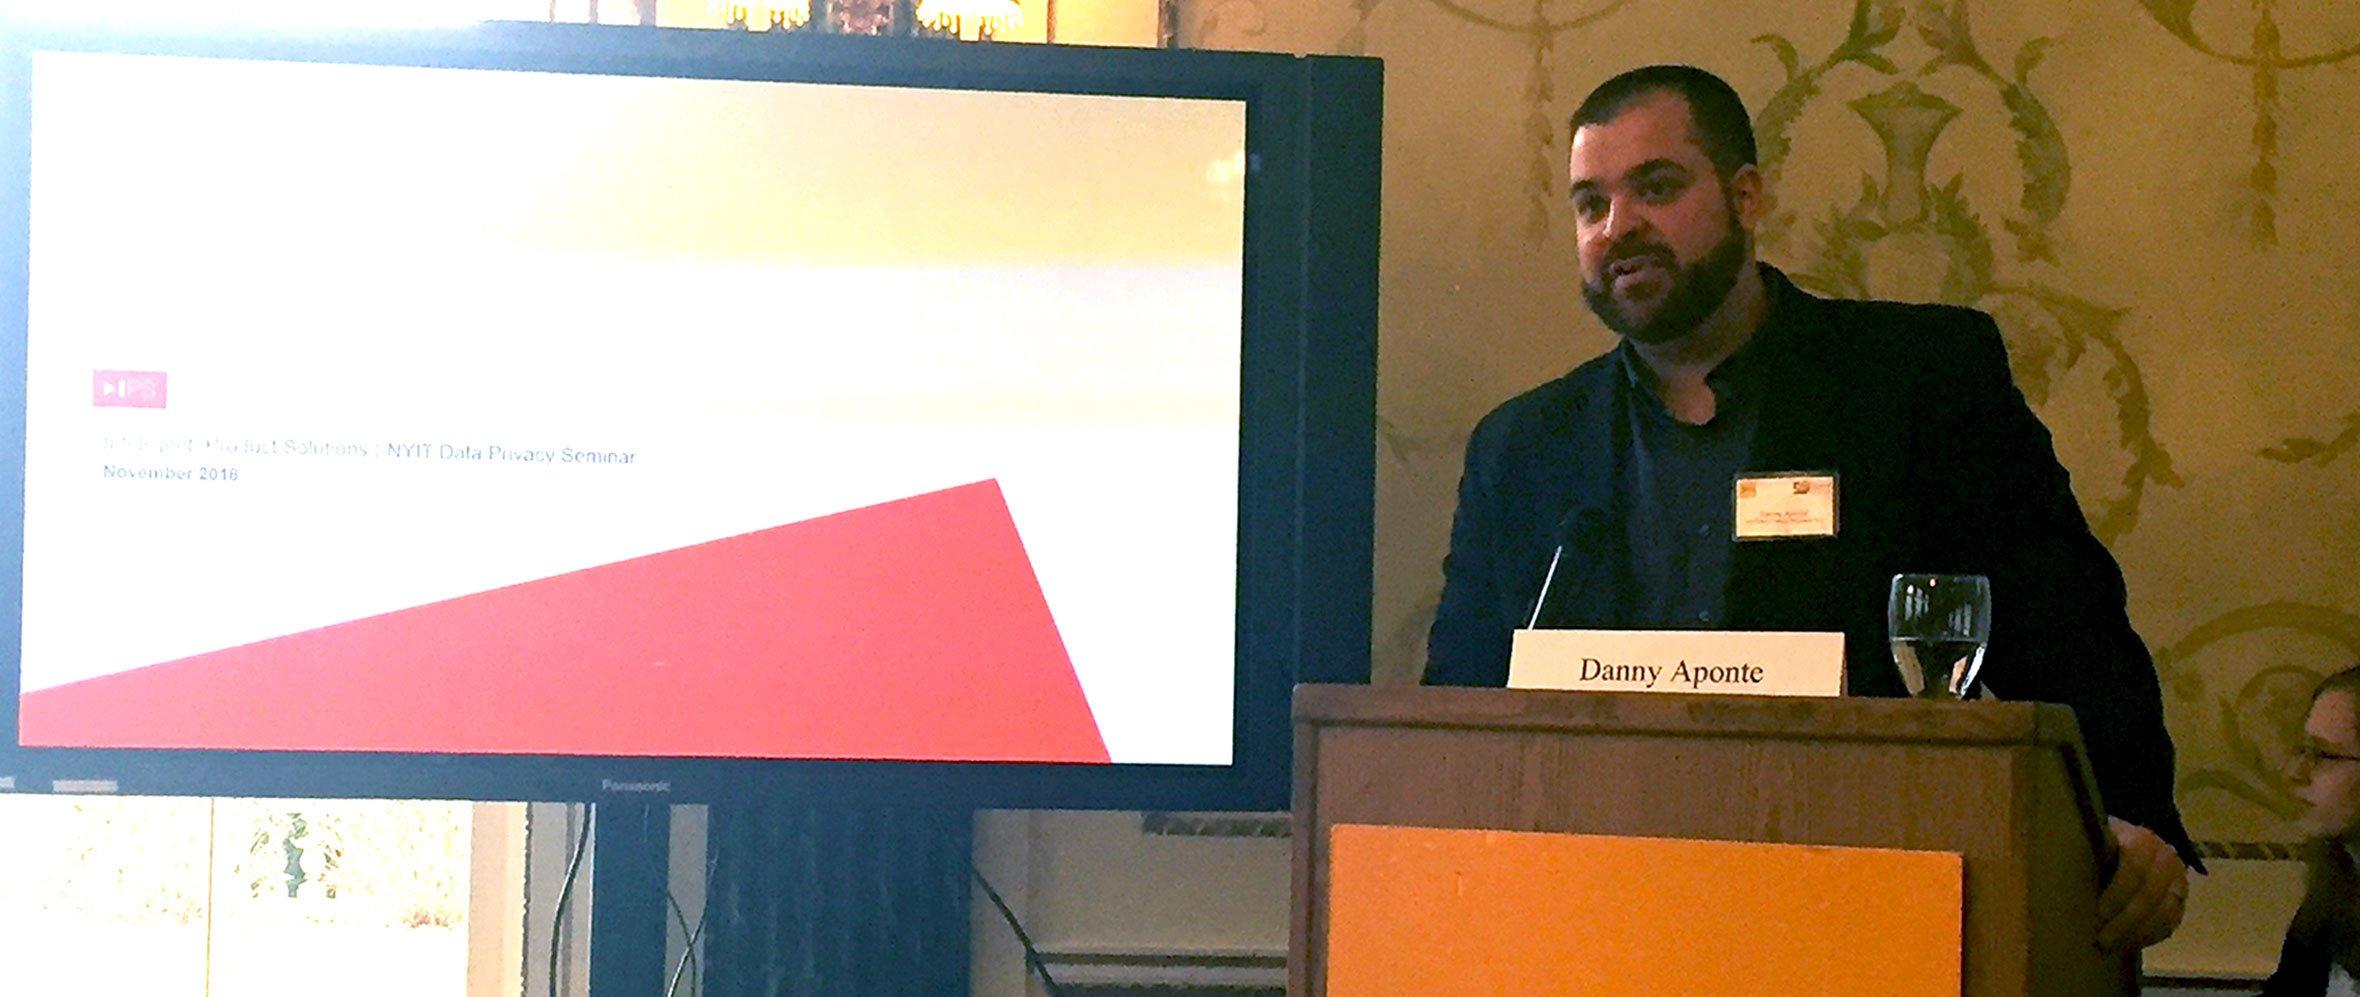 Danny Aponte Speaks at Global Privacy Laws Seminar